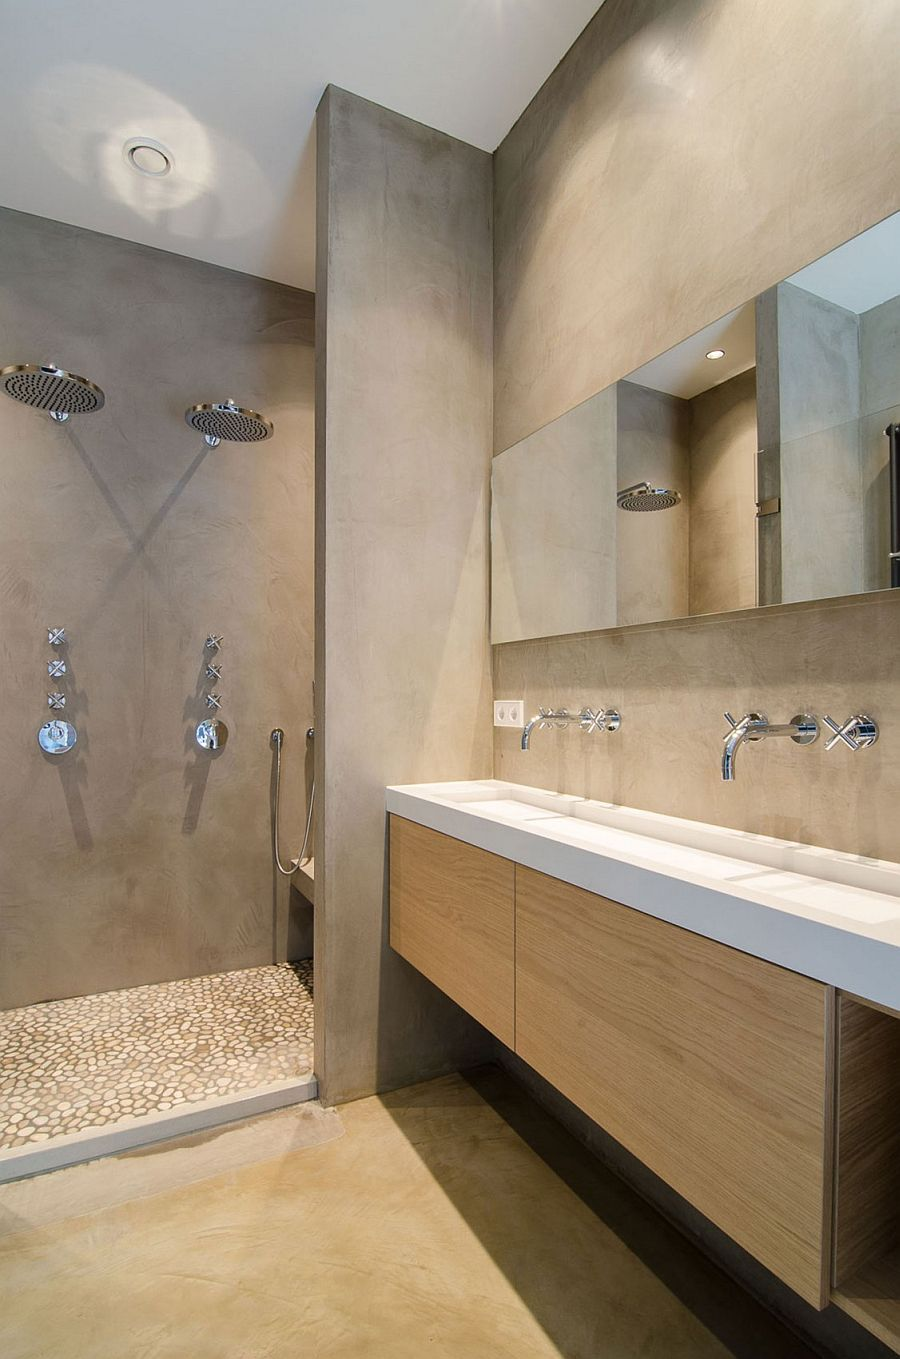 Concrete walls inside the contemporary bathroom